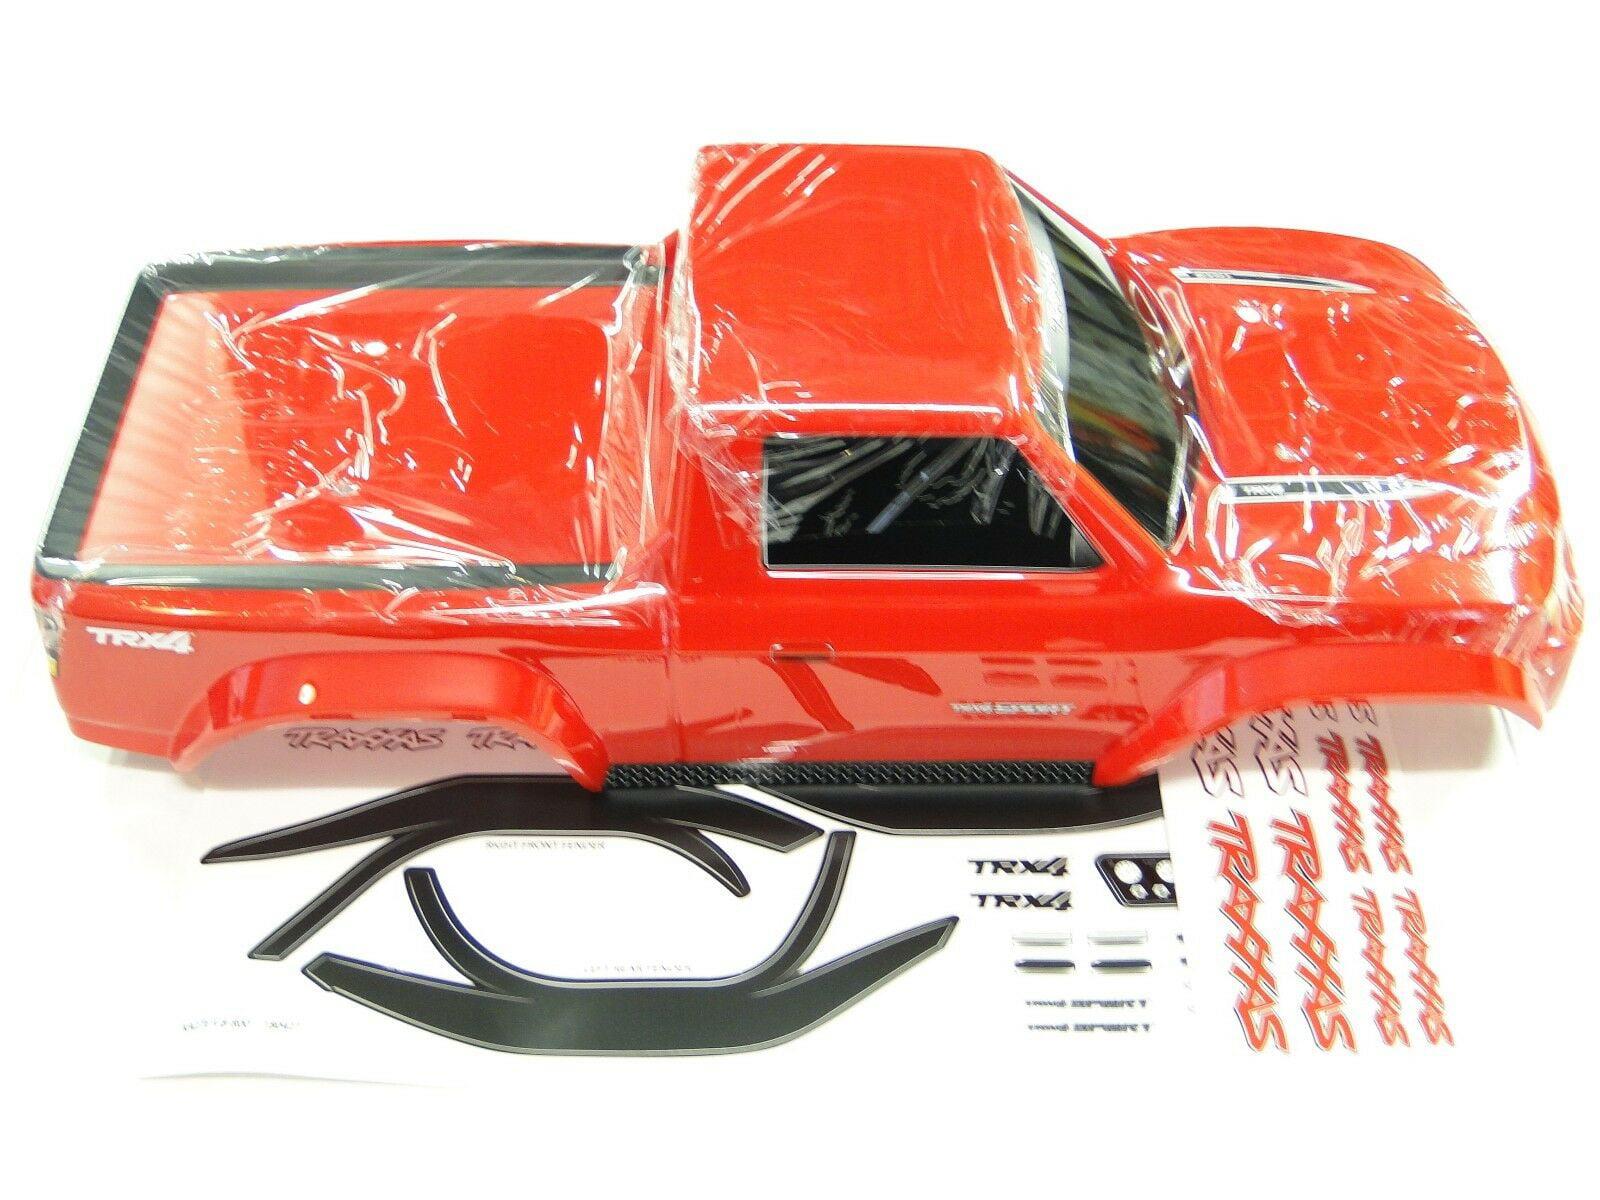 New Traxxas Trx 4 Sport Body Factory Painted Red Rz3r Walmart Com Walmart Com